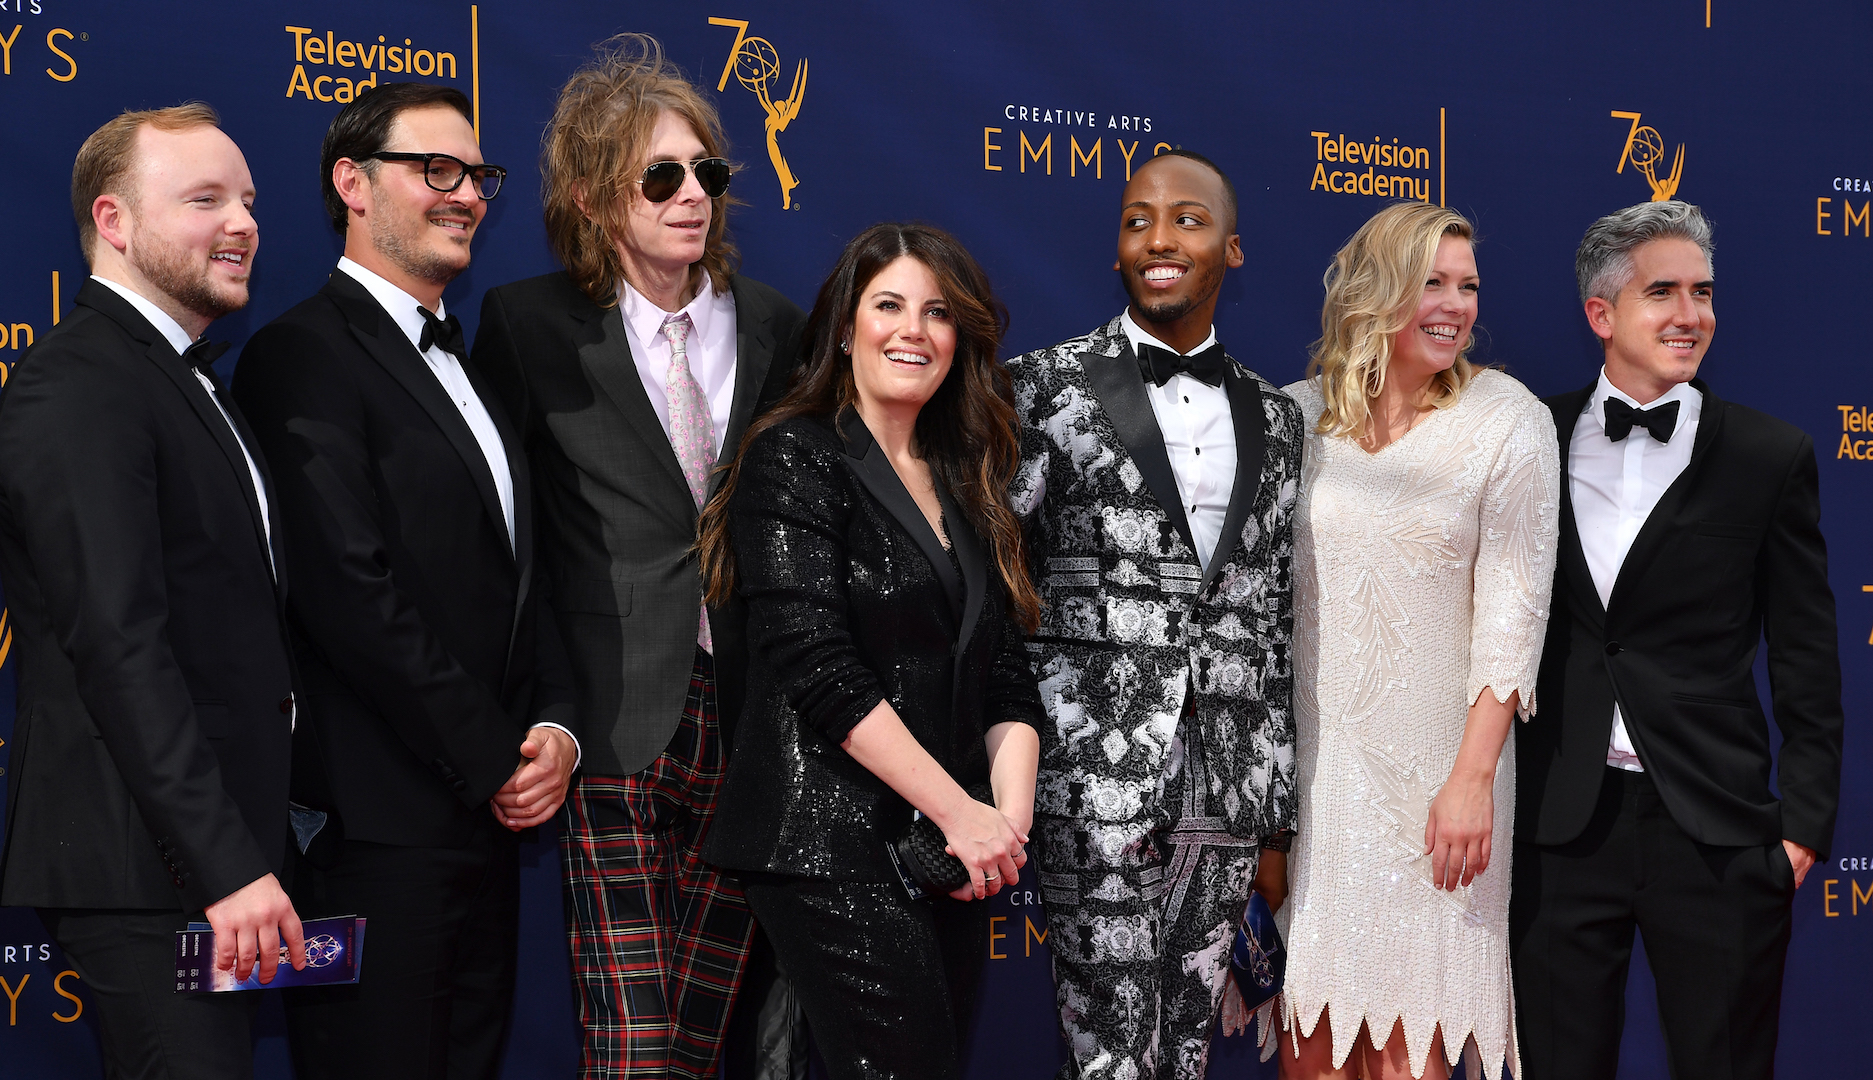 The Corner Shop 4chion Lifestyle Emmys